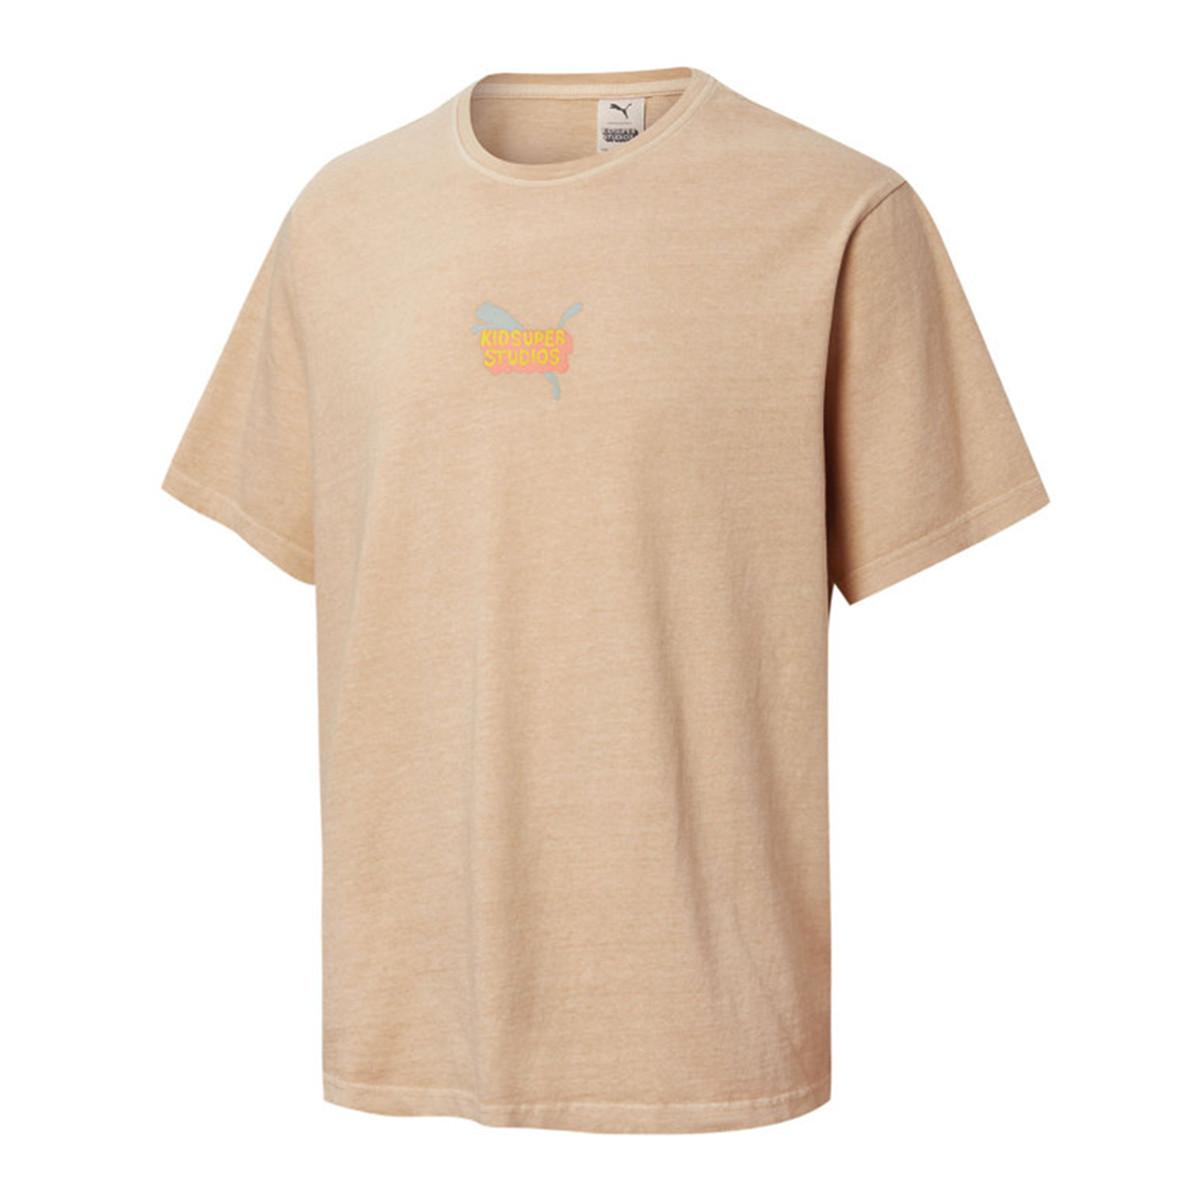 PUMA 彪马 KIDSUPER联名 59846512 男款短袖运动T恤